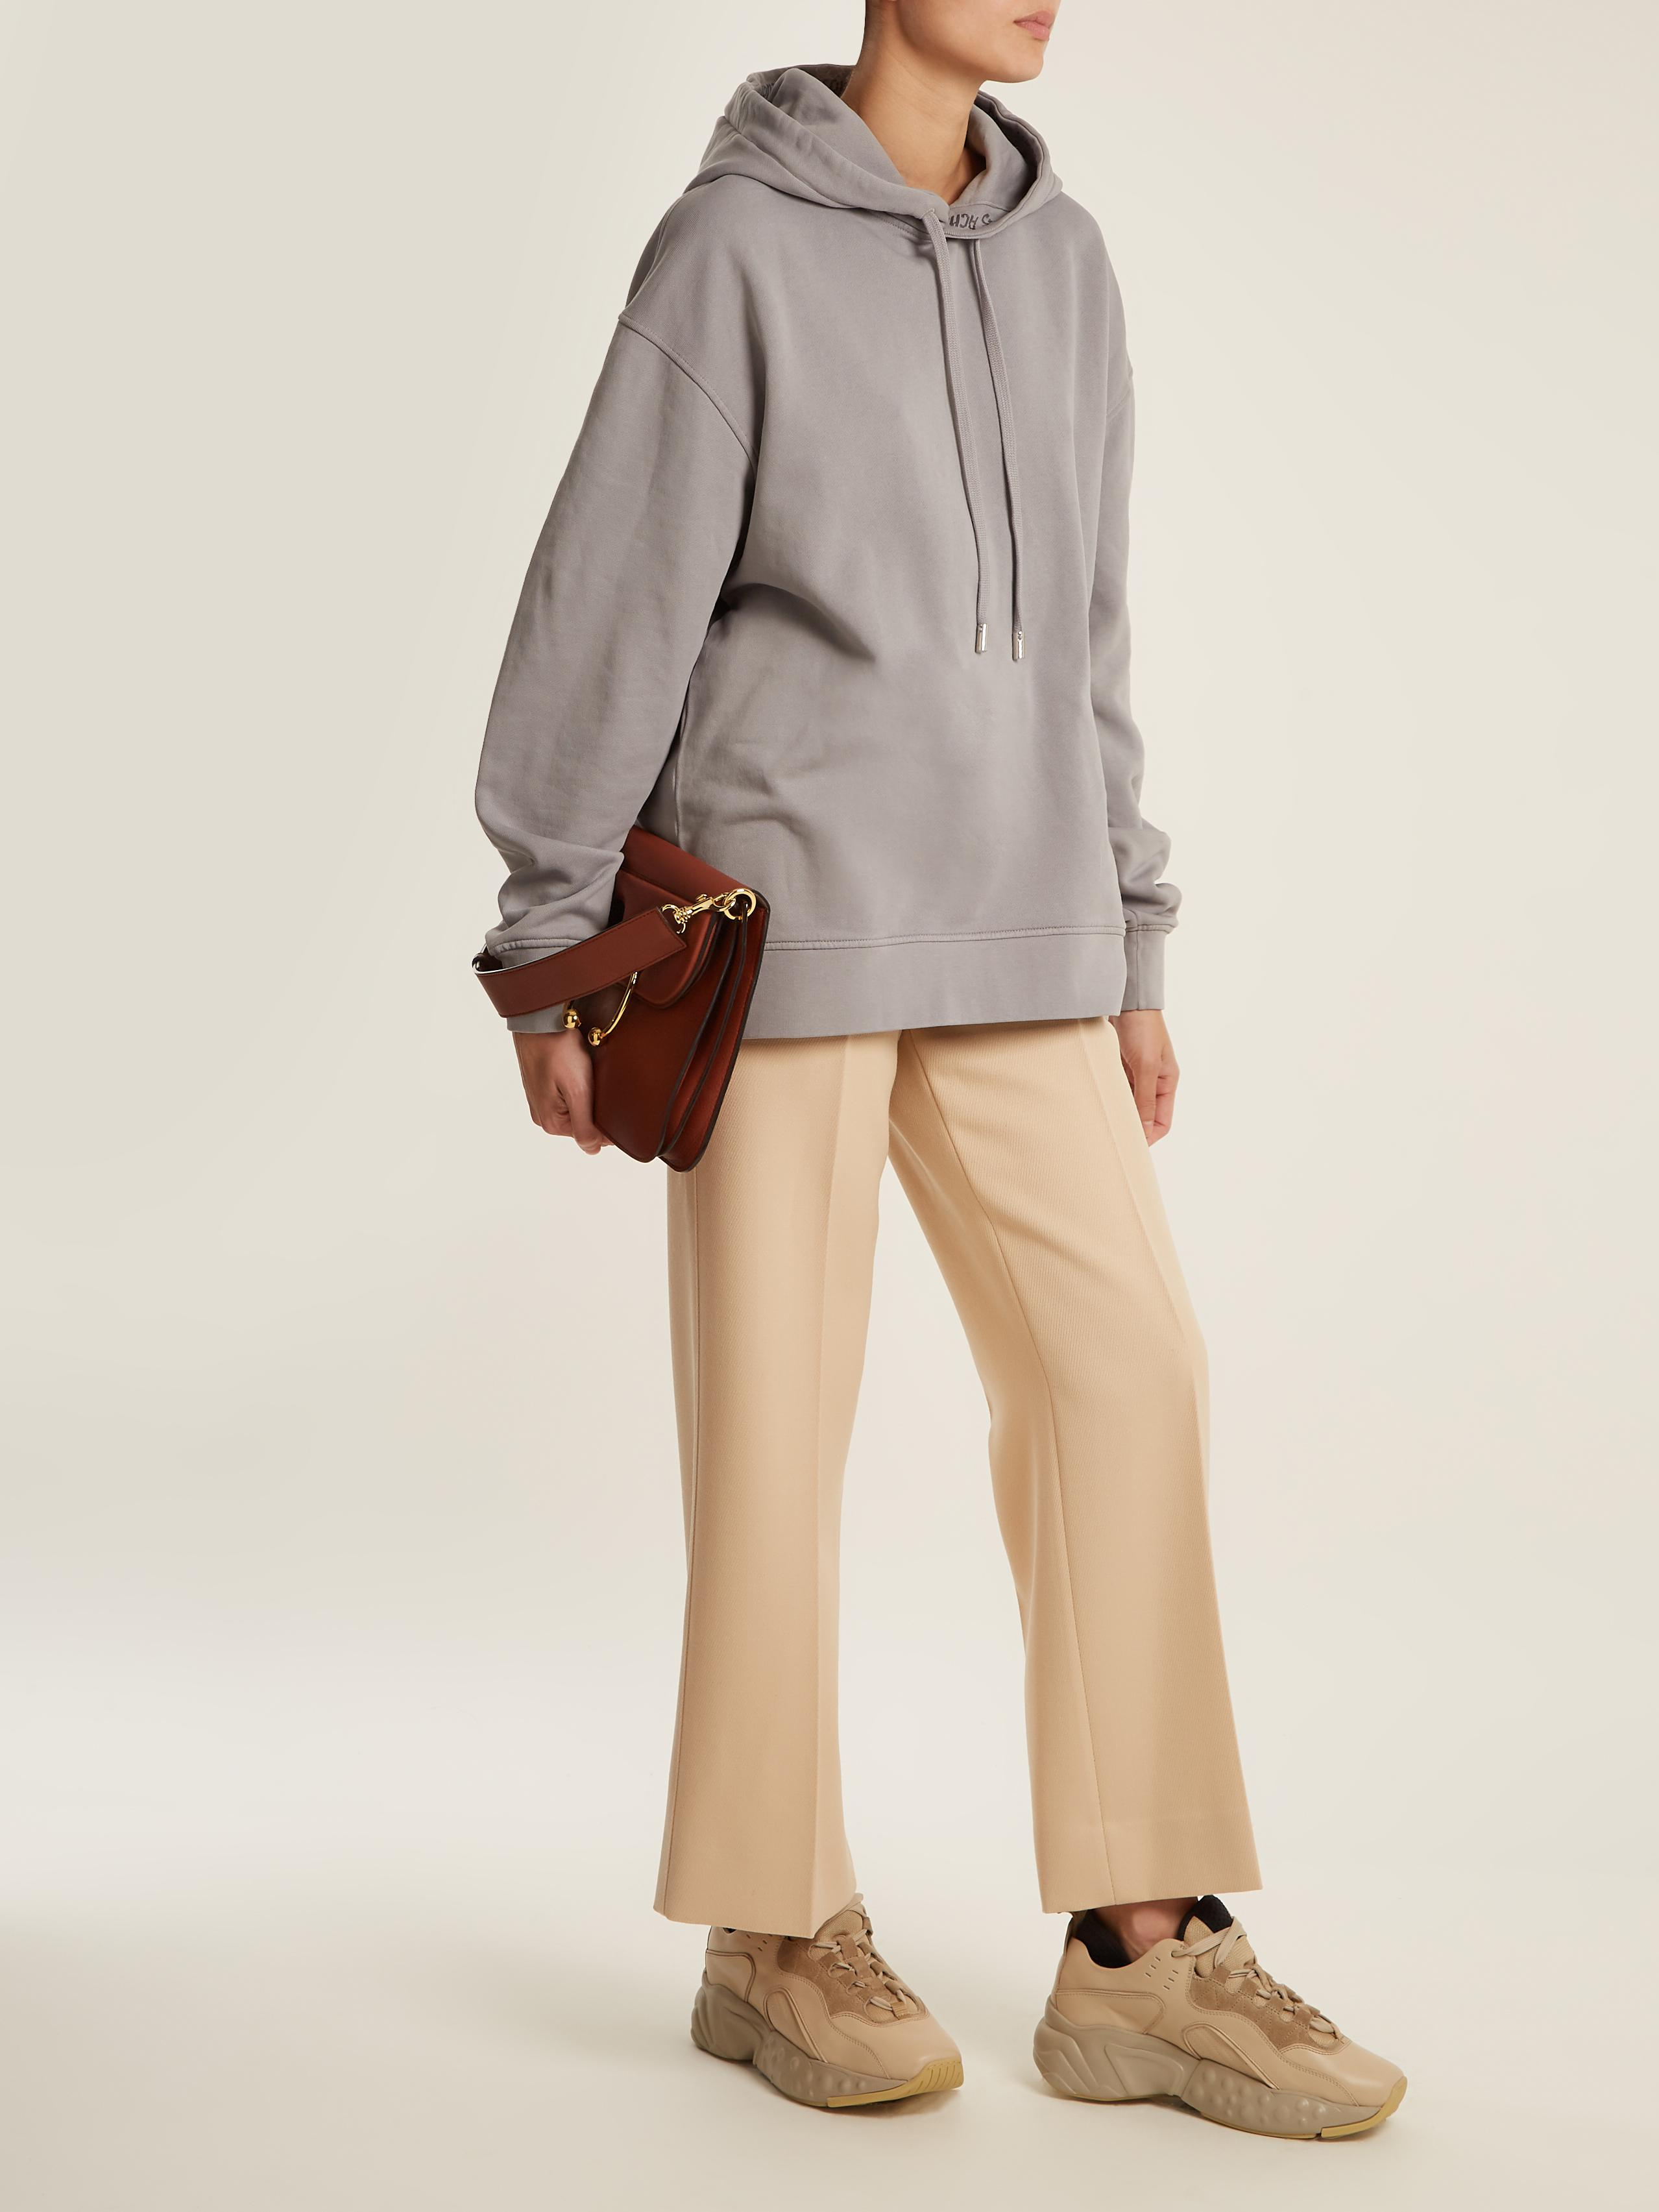 Acne Studios Manhattan Low-top Leather